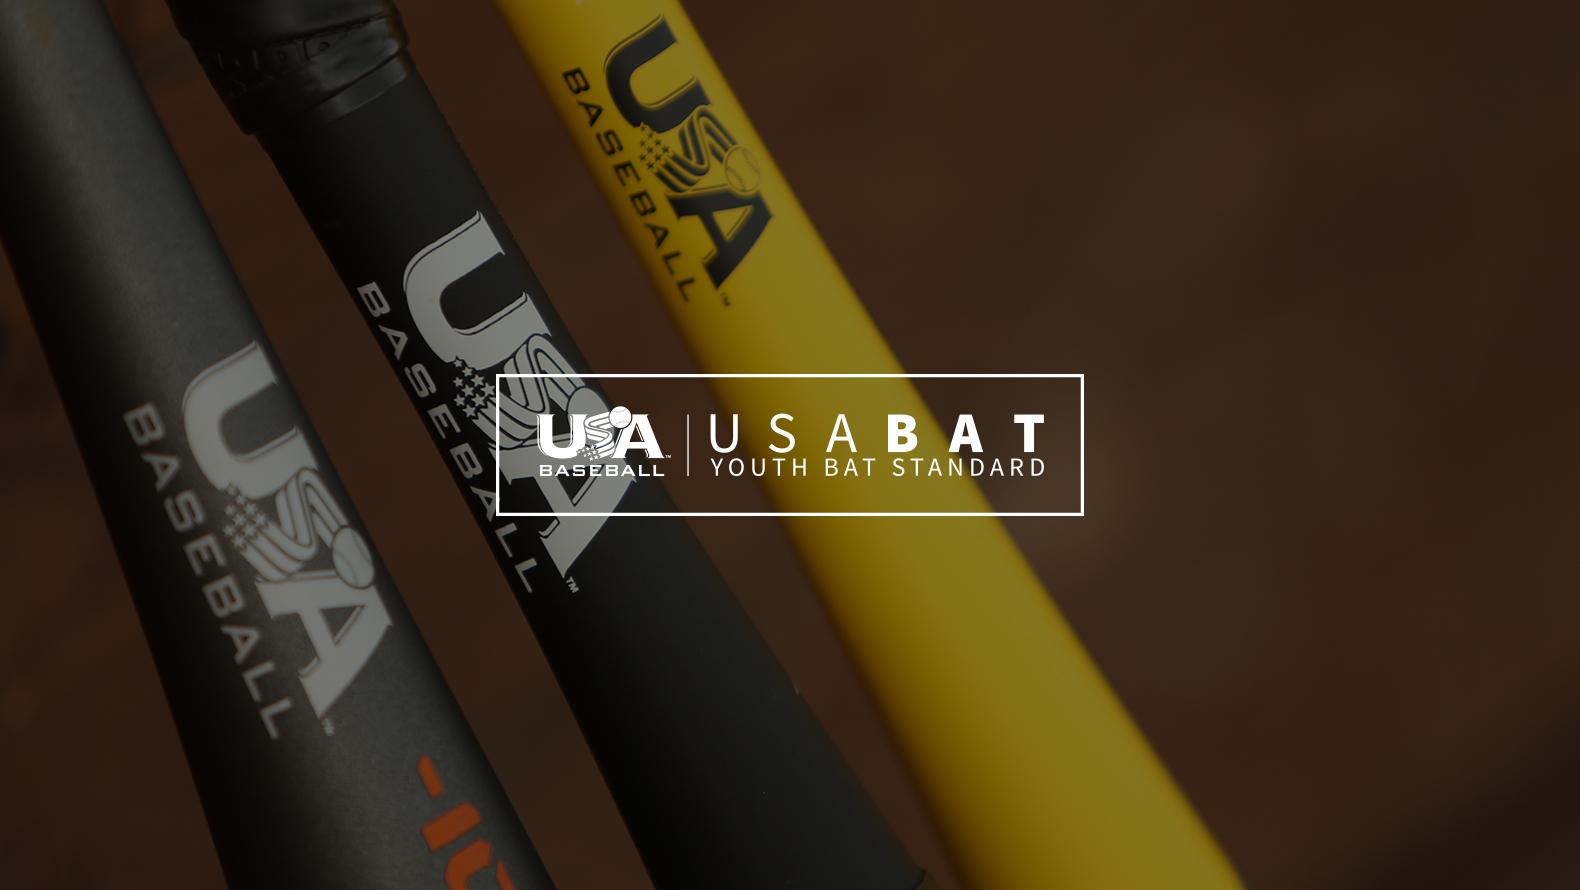 About USABat.